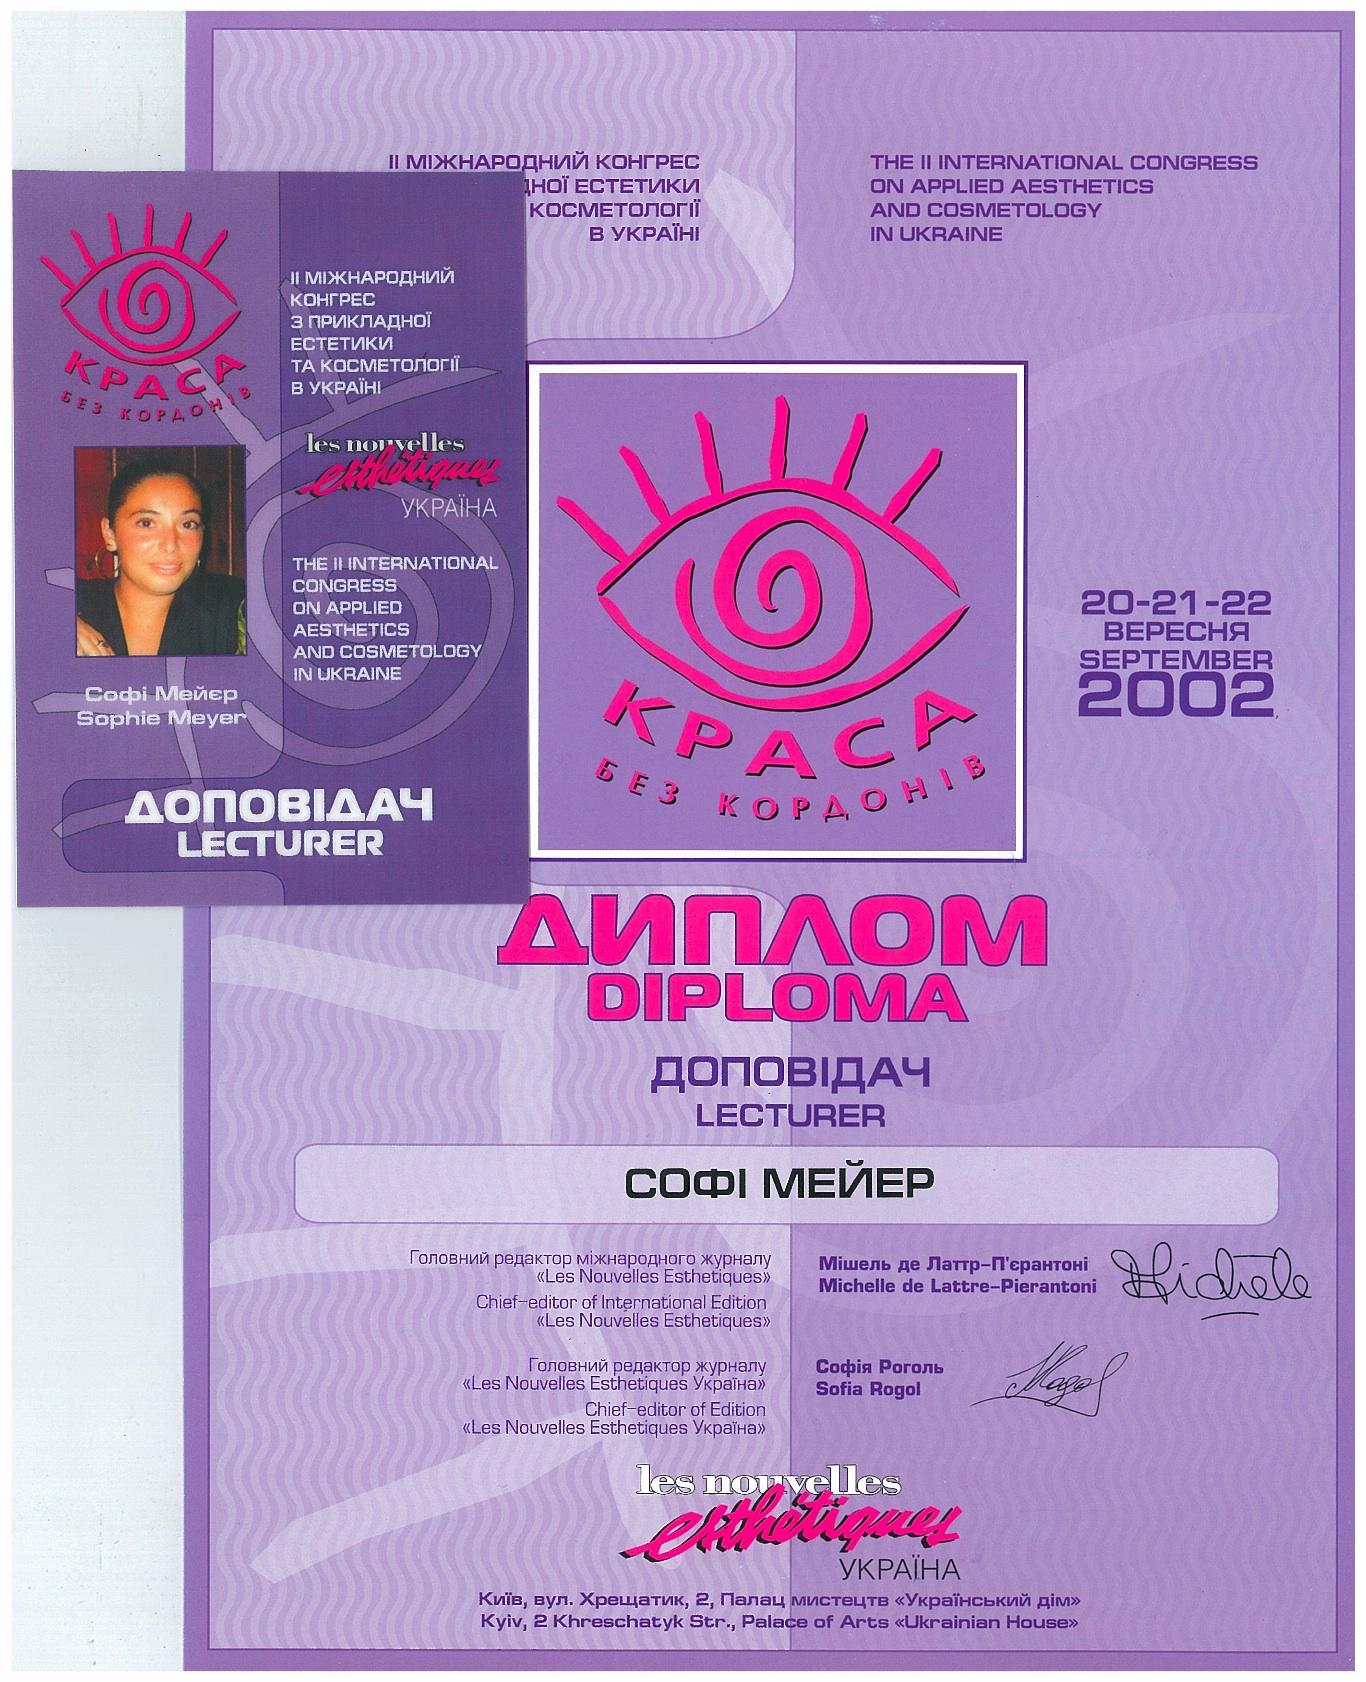 Moscou 2002 bis